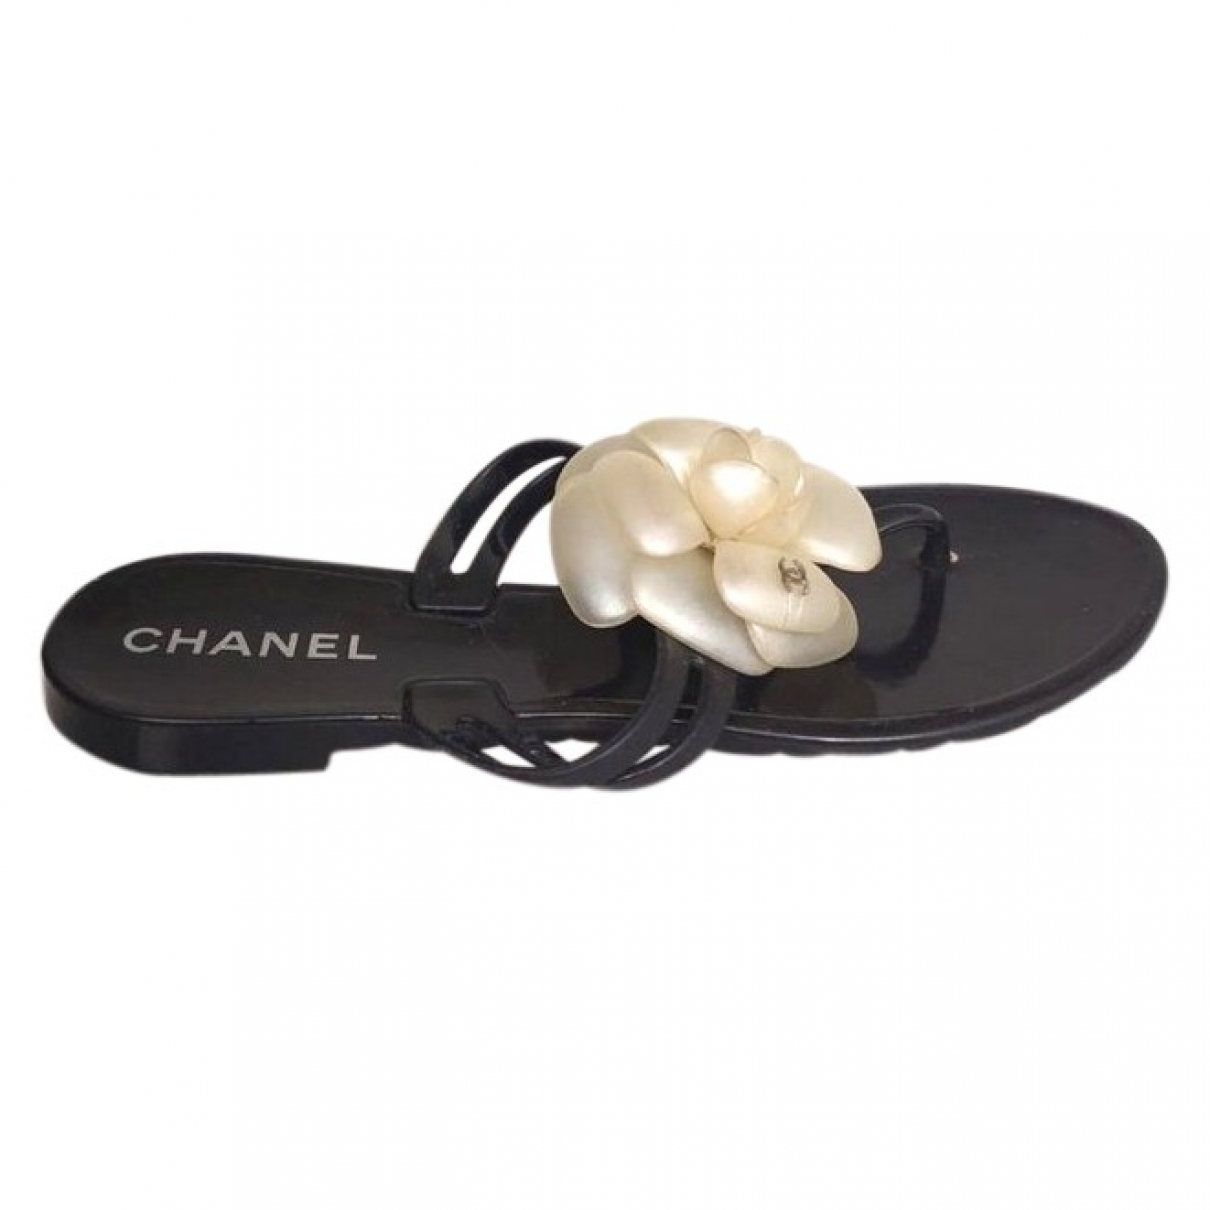 Chanel \N Black Sandals for Women 36 EU